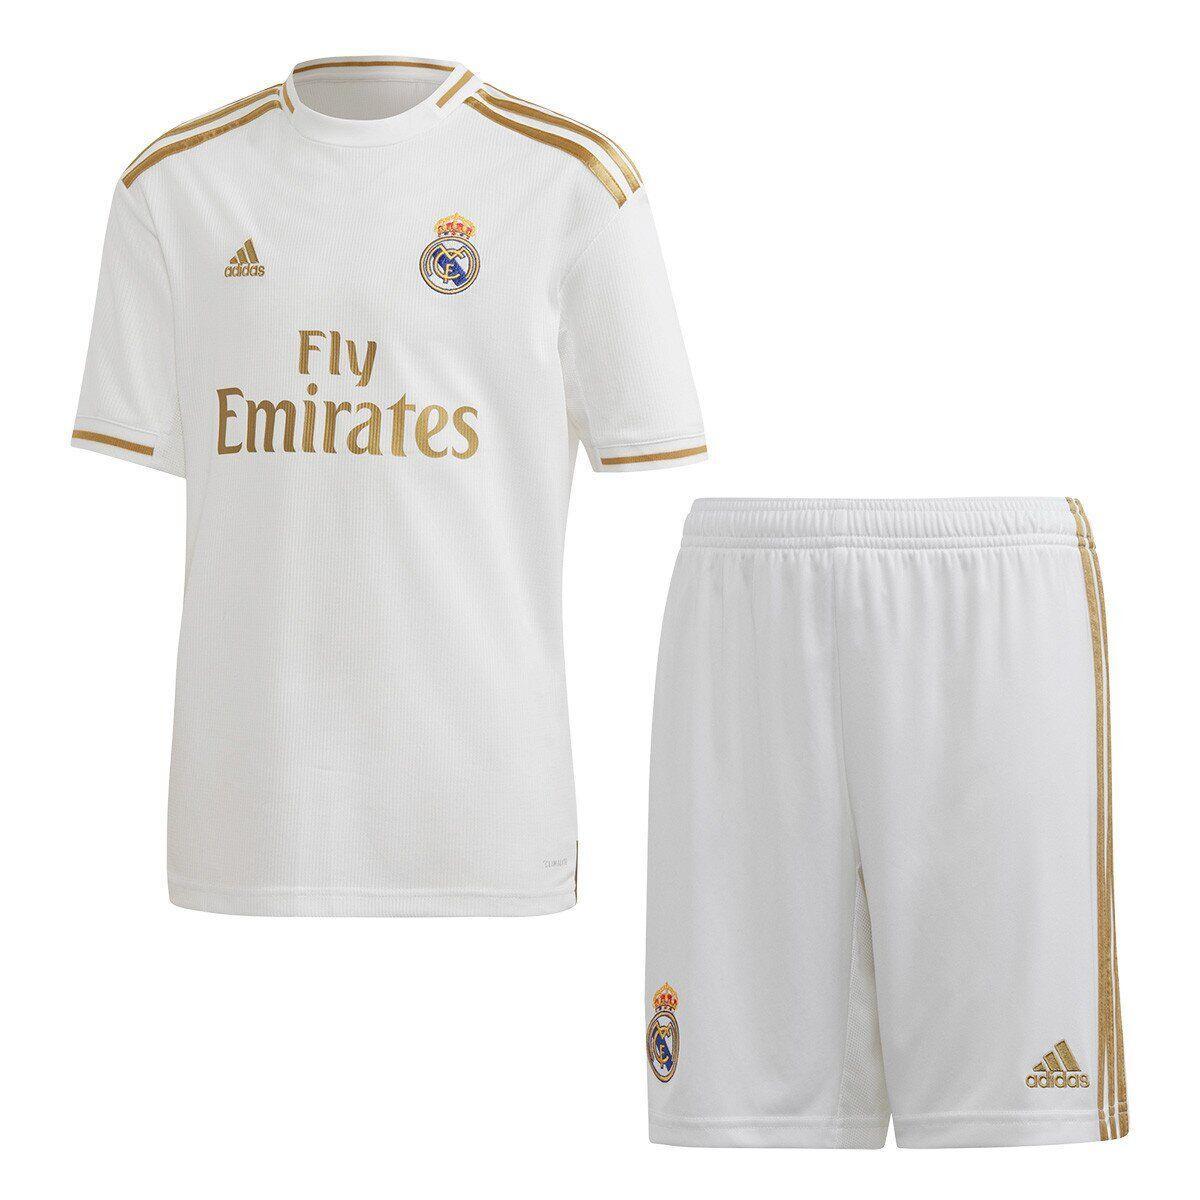 Футбольная форма Реал Мадрид, дом/белый (Real Madrid) сезон 19/20